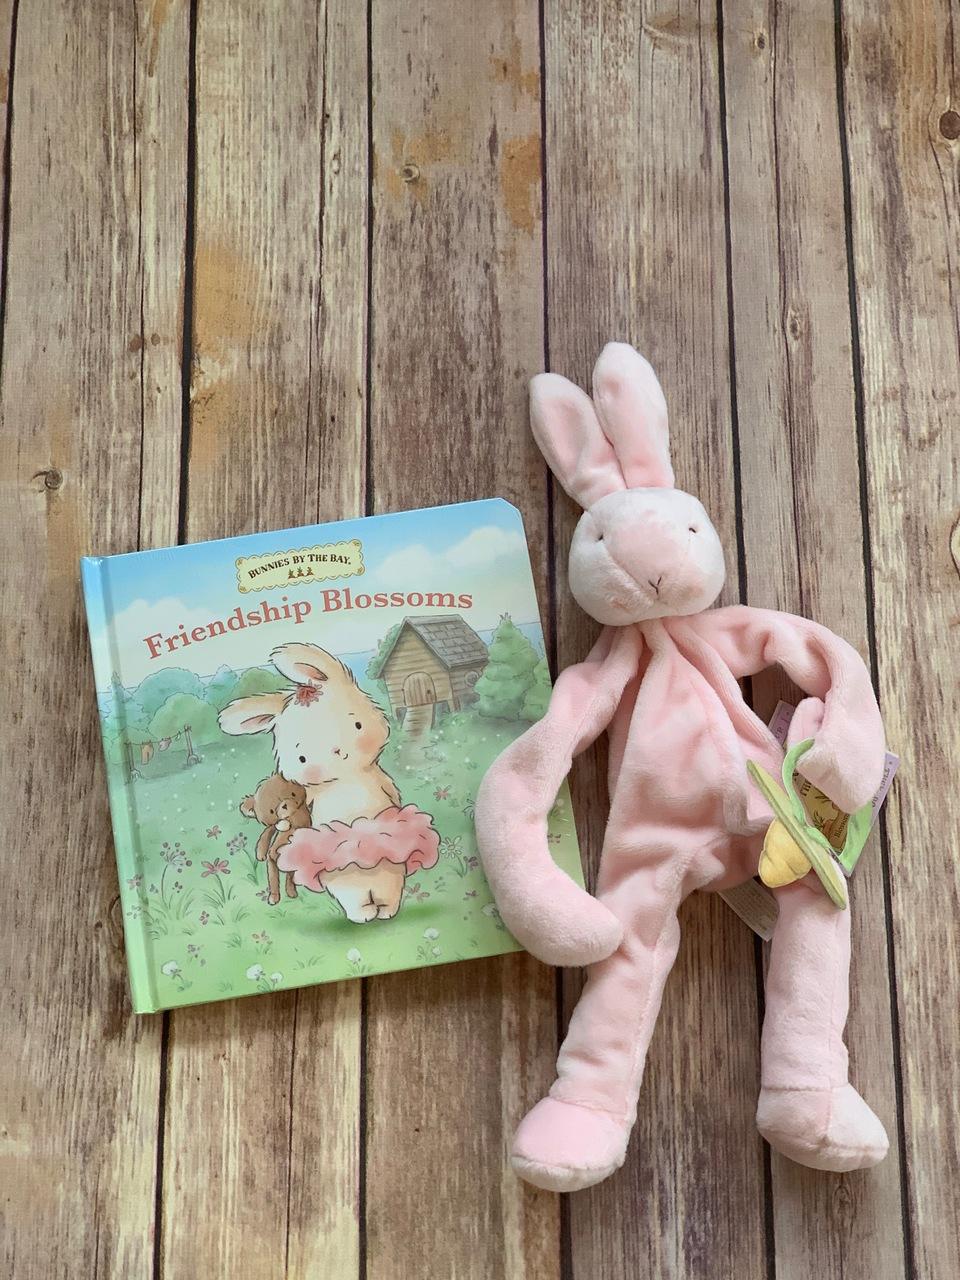 Add a Book and Buddy -Friendship Blossom